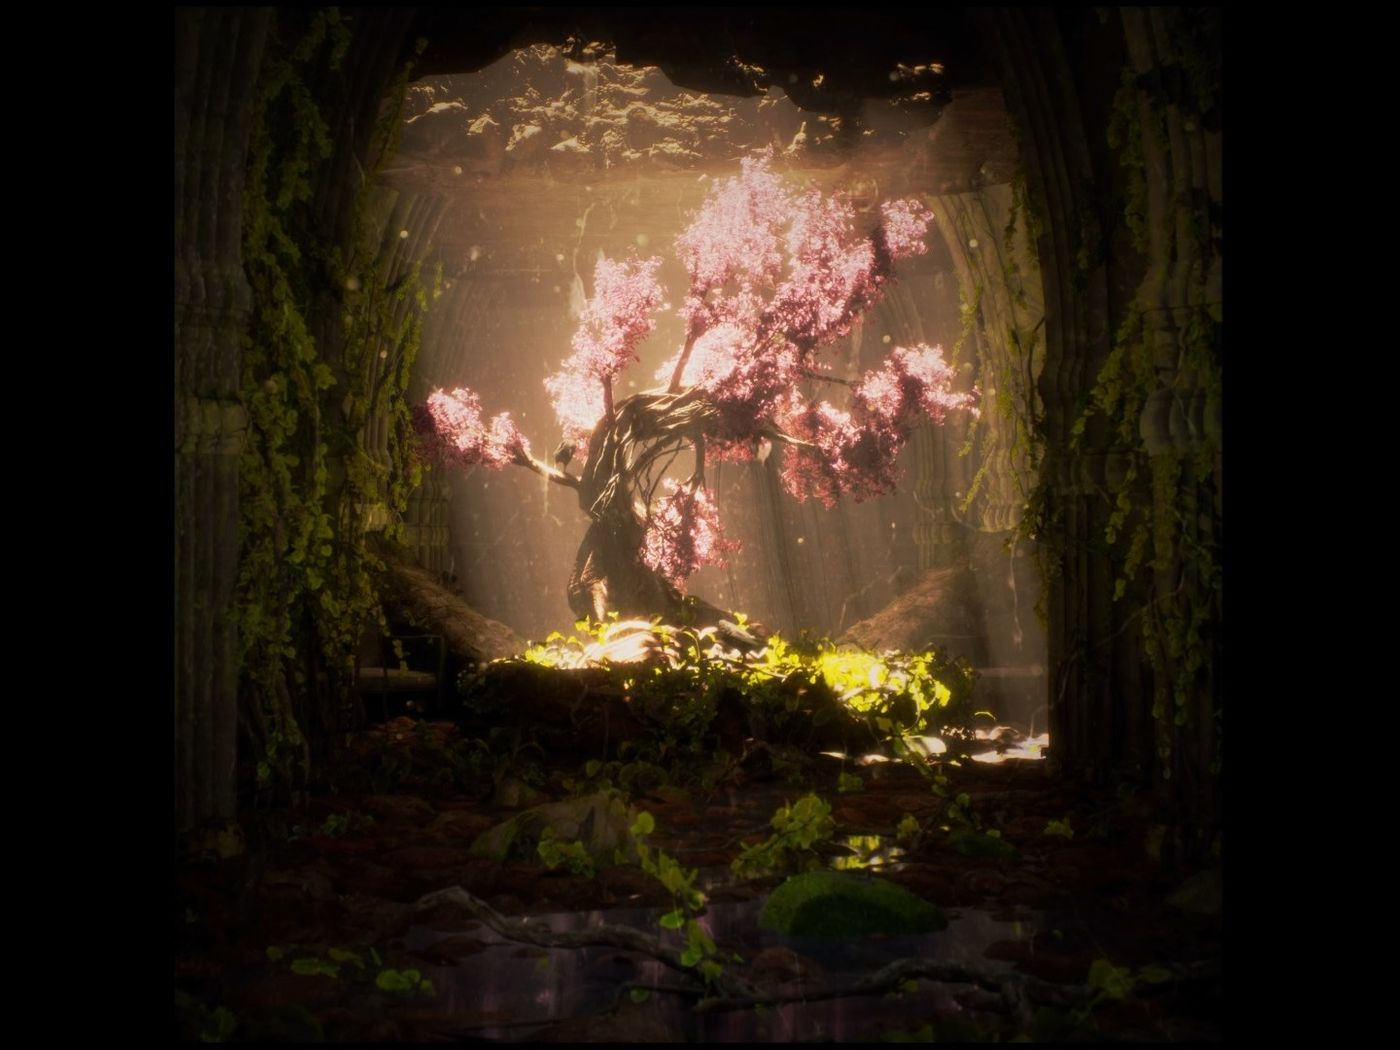 Environment Design Using Unreal Engine 4